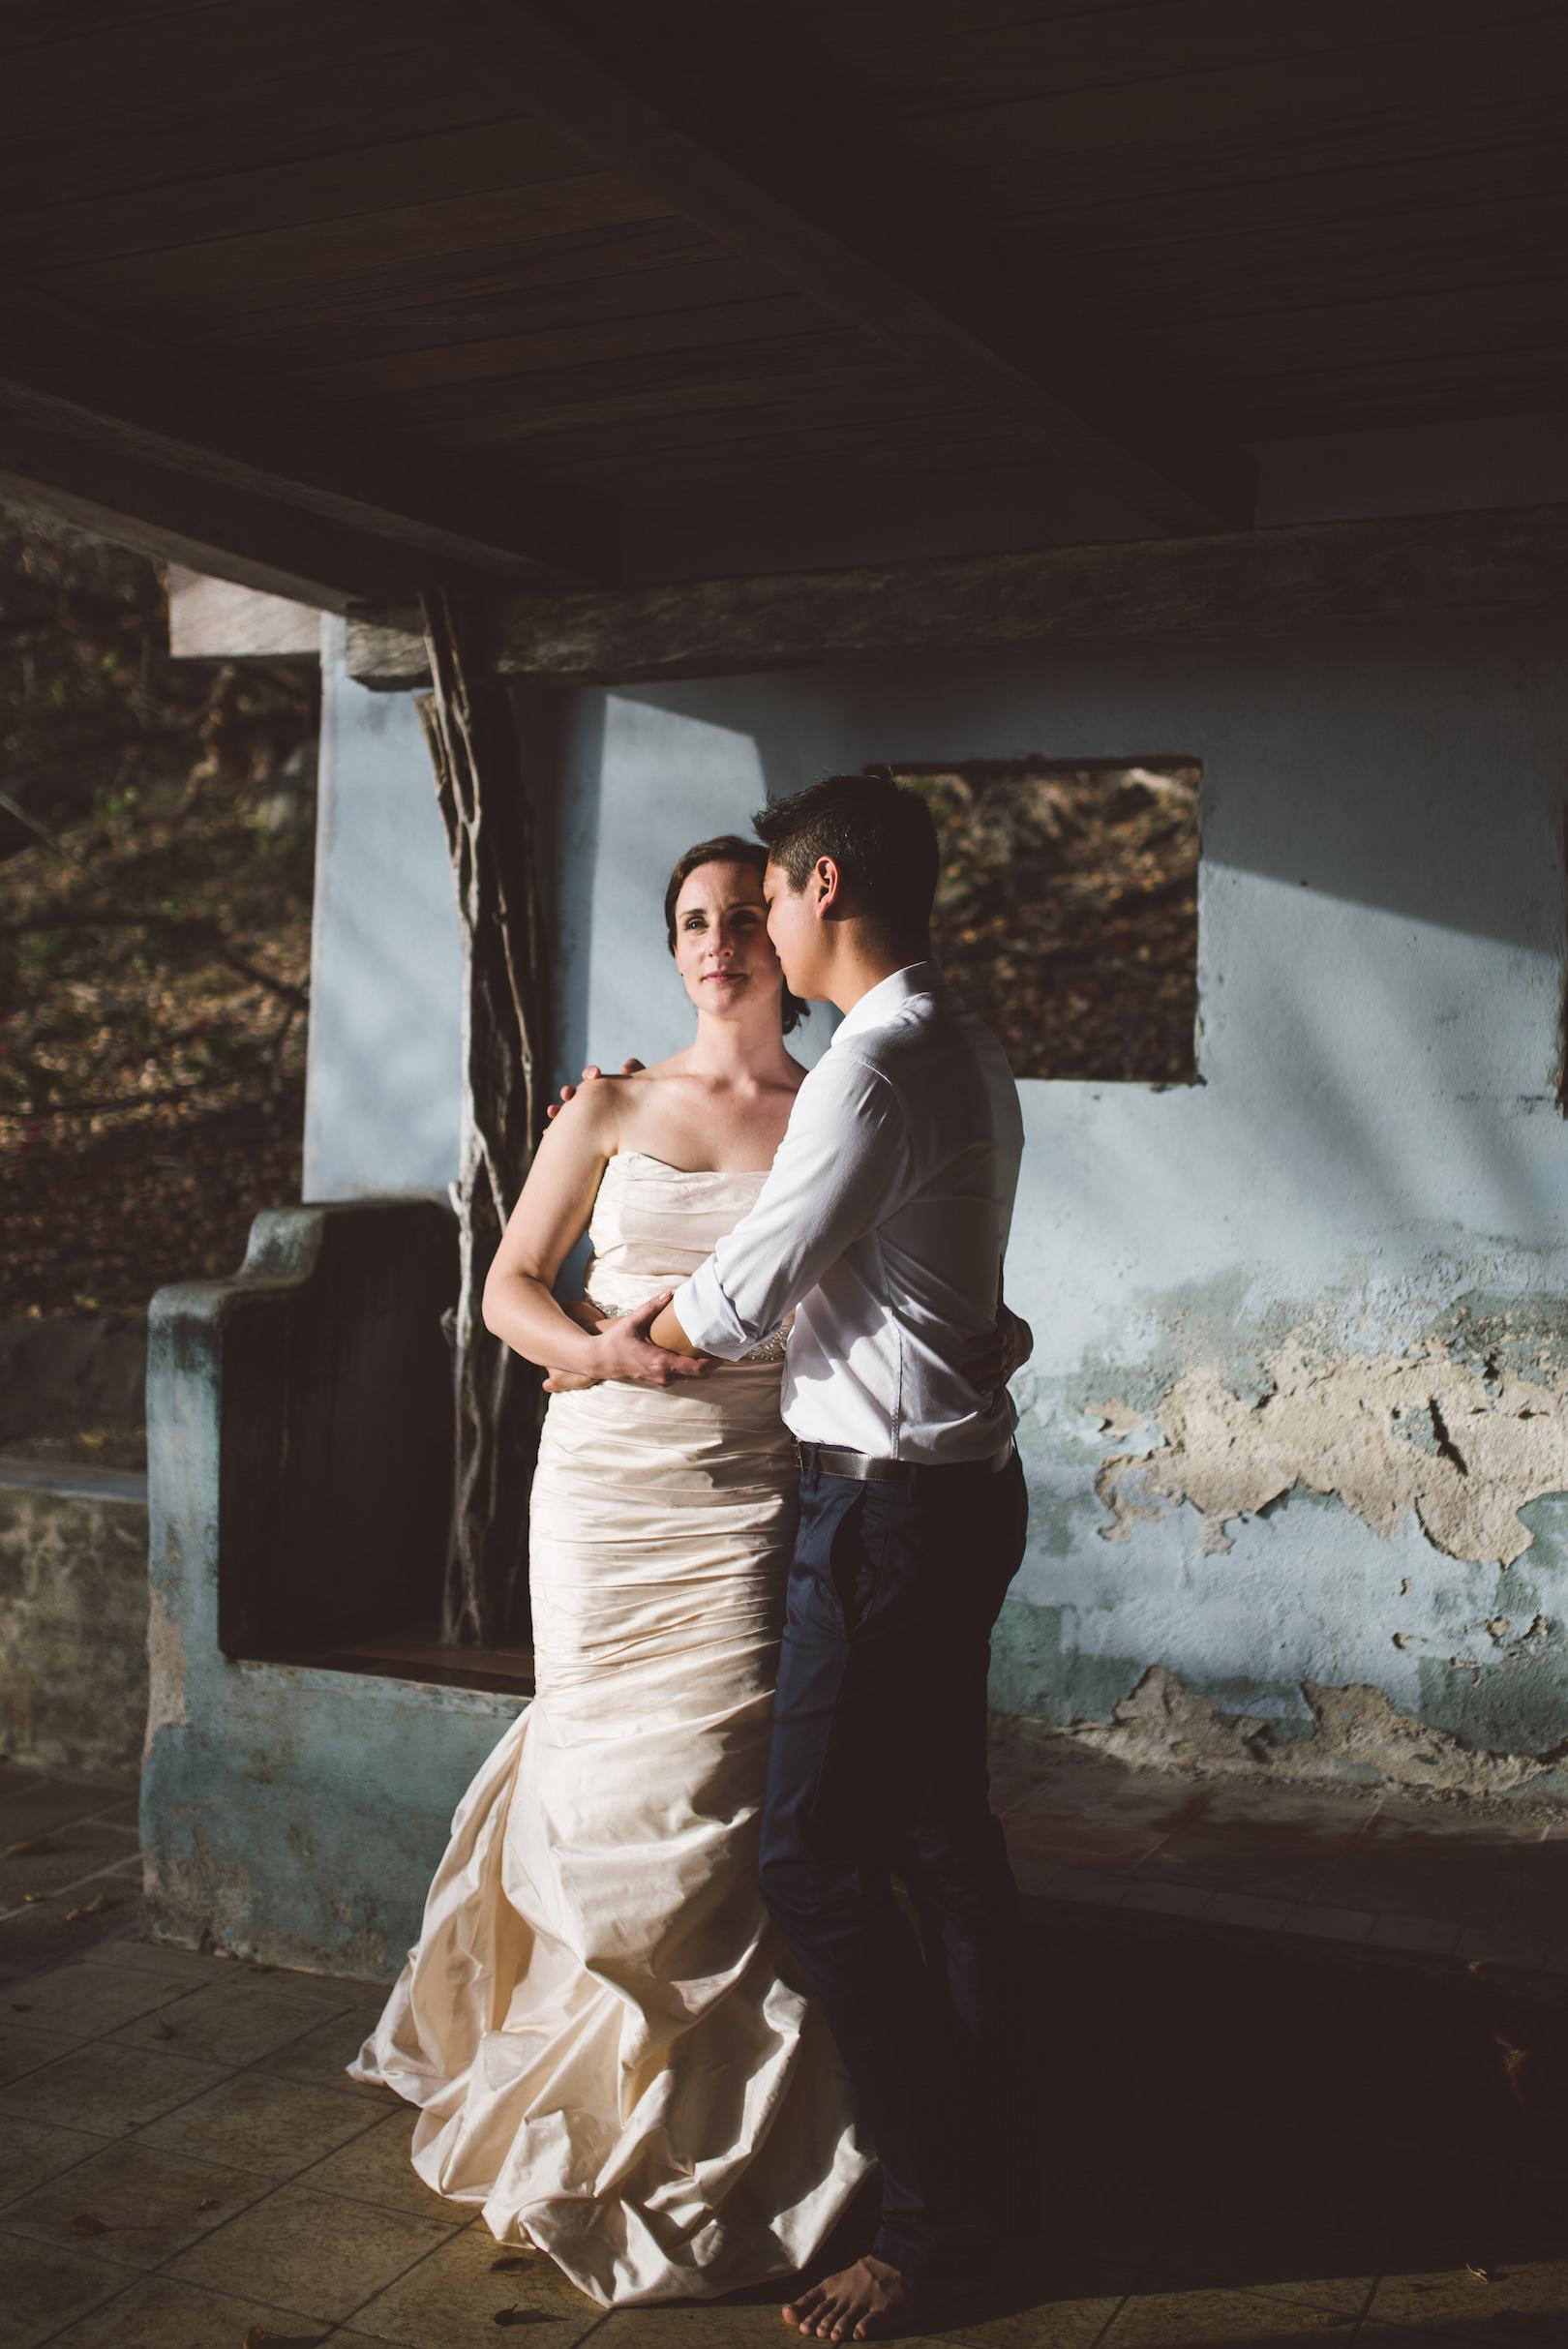 Steve & Mika - Sayulita - © Dallas Kolotylo Photography - 780